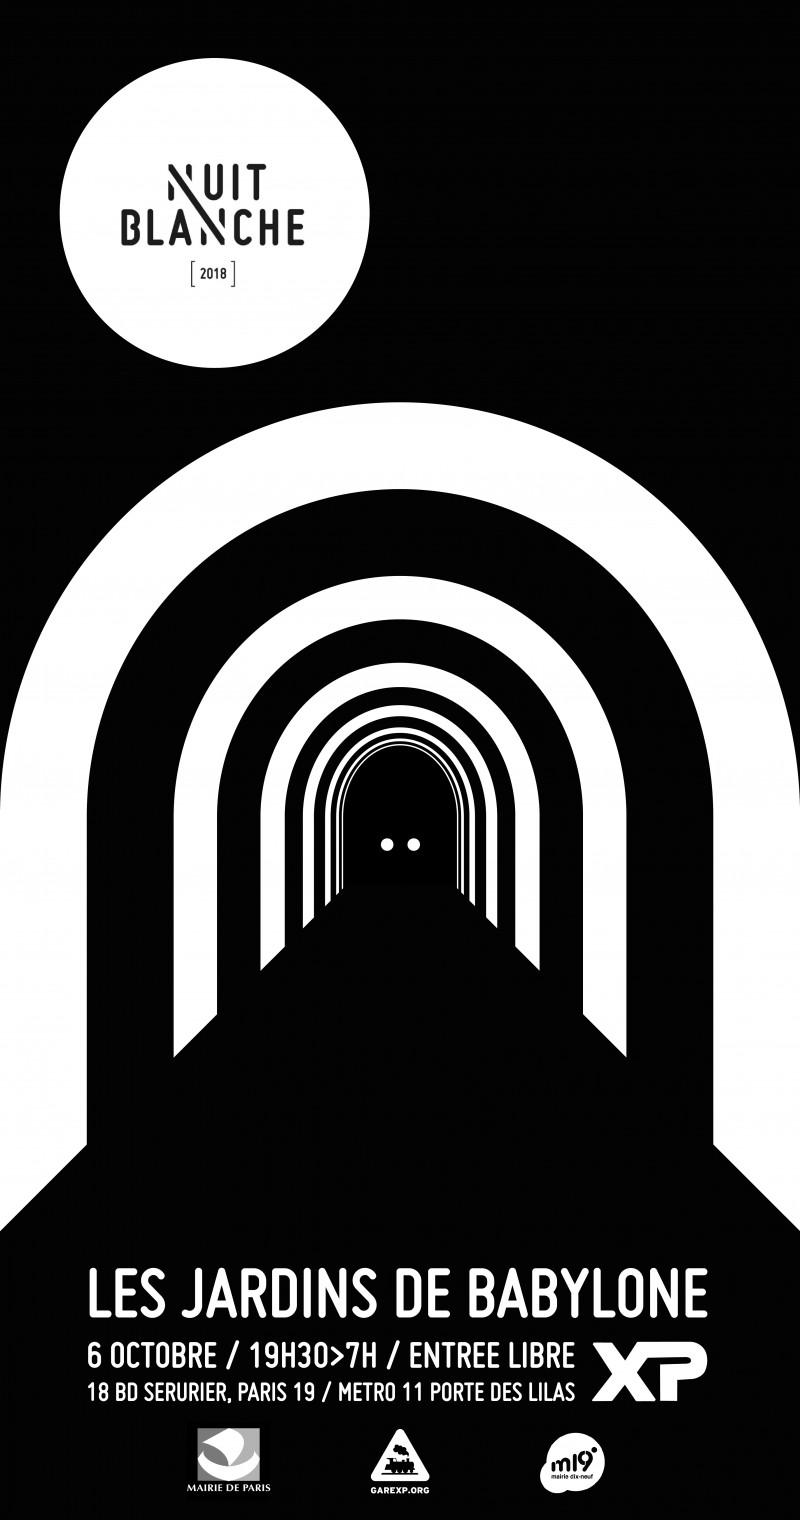 affiche-nuit-blanche-2018-gare-xp-823d6f1a417e02f7c403c872e5ff4cac